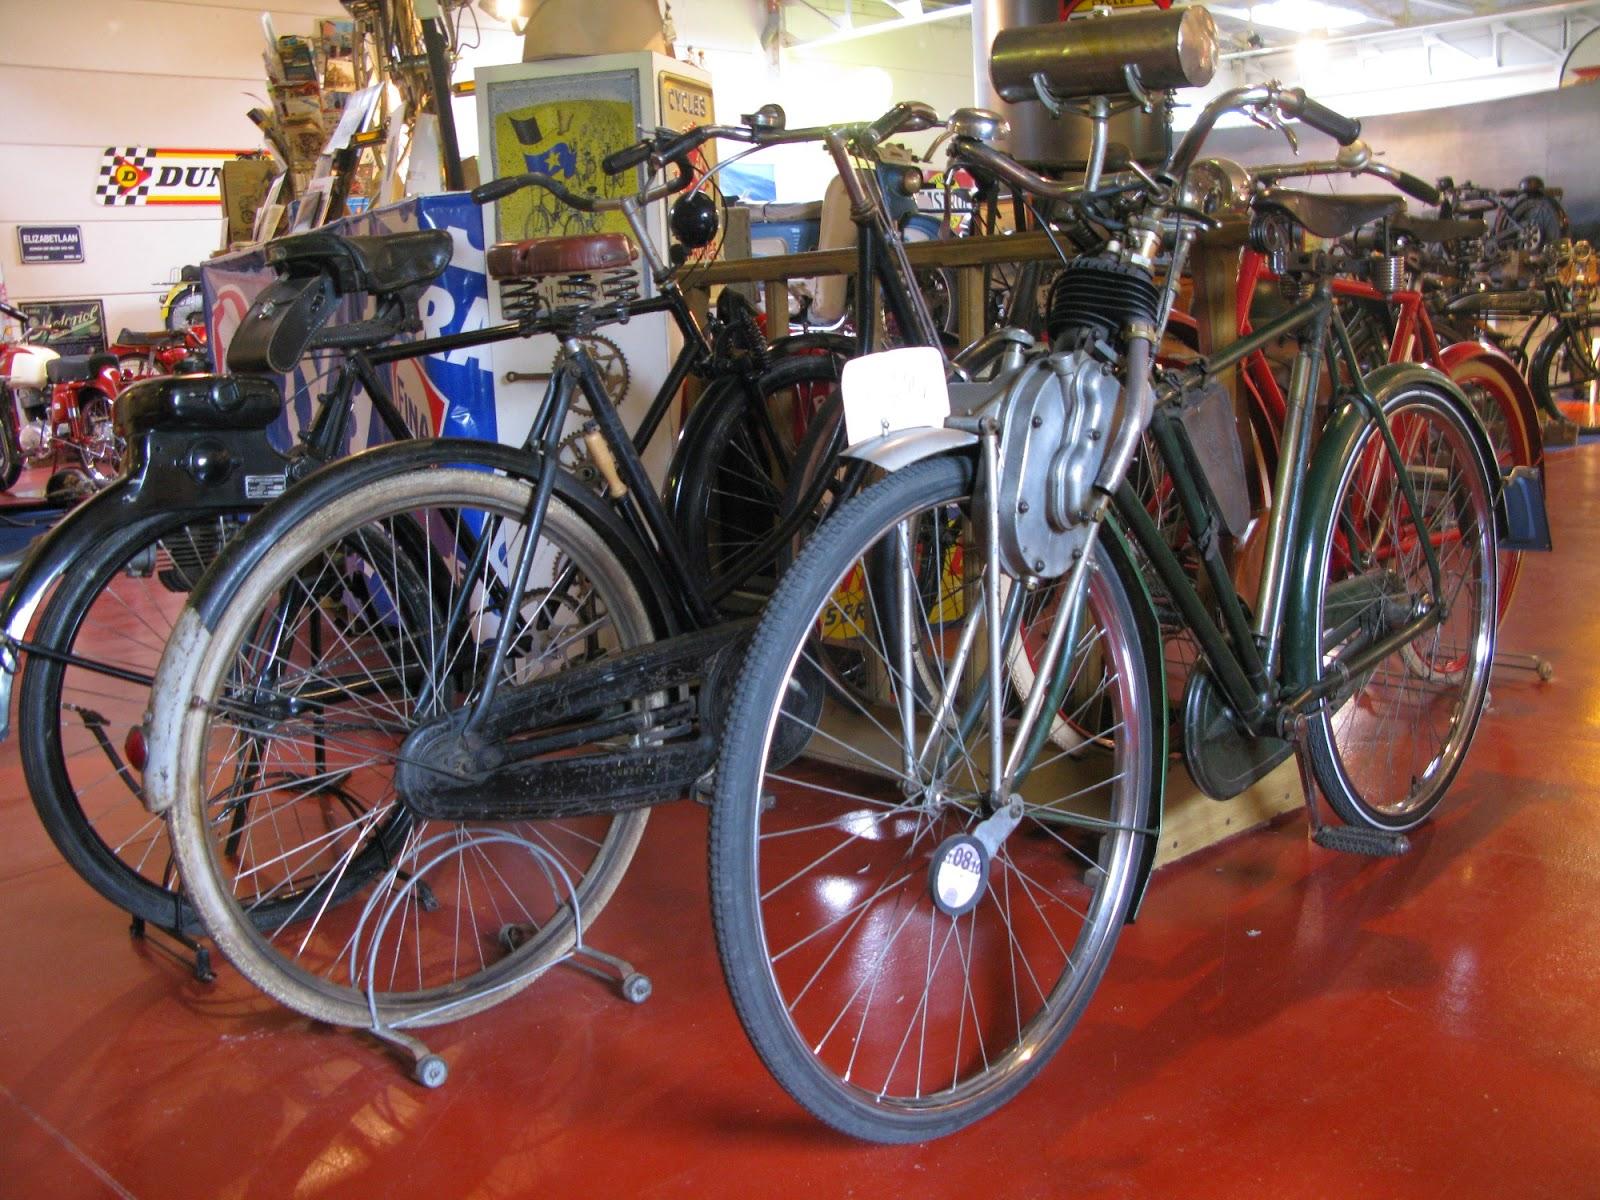 Cyclotracteur cyclemotor on Raleigh cross frame cycle